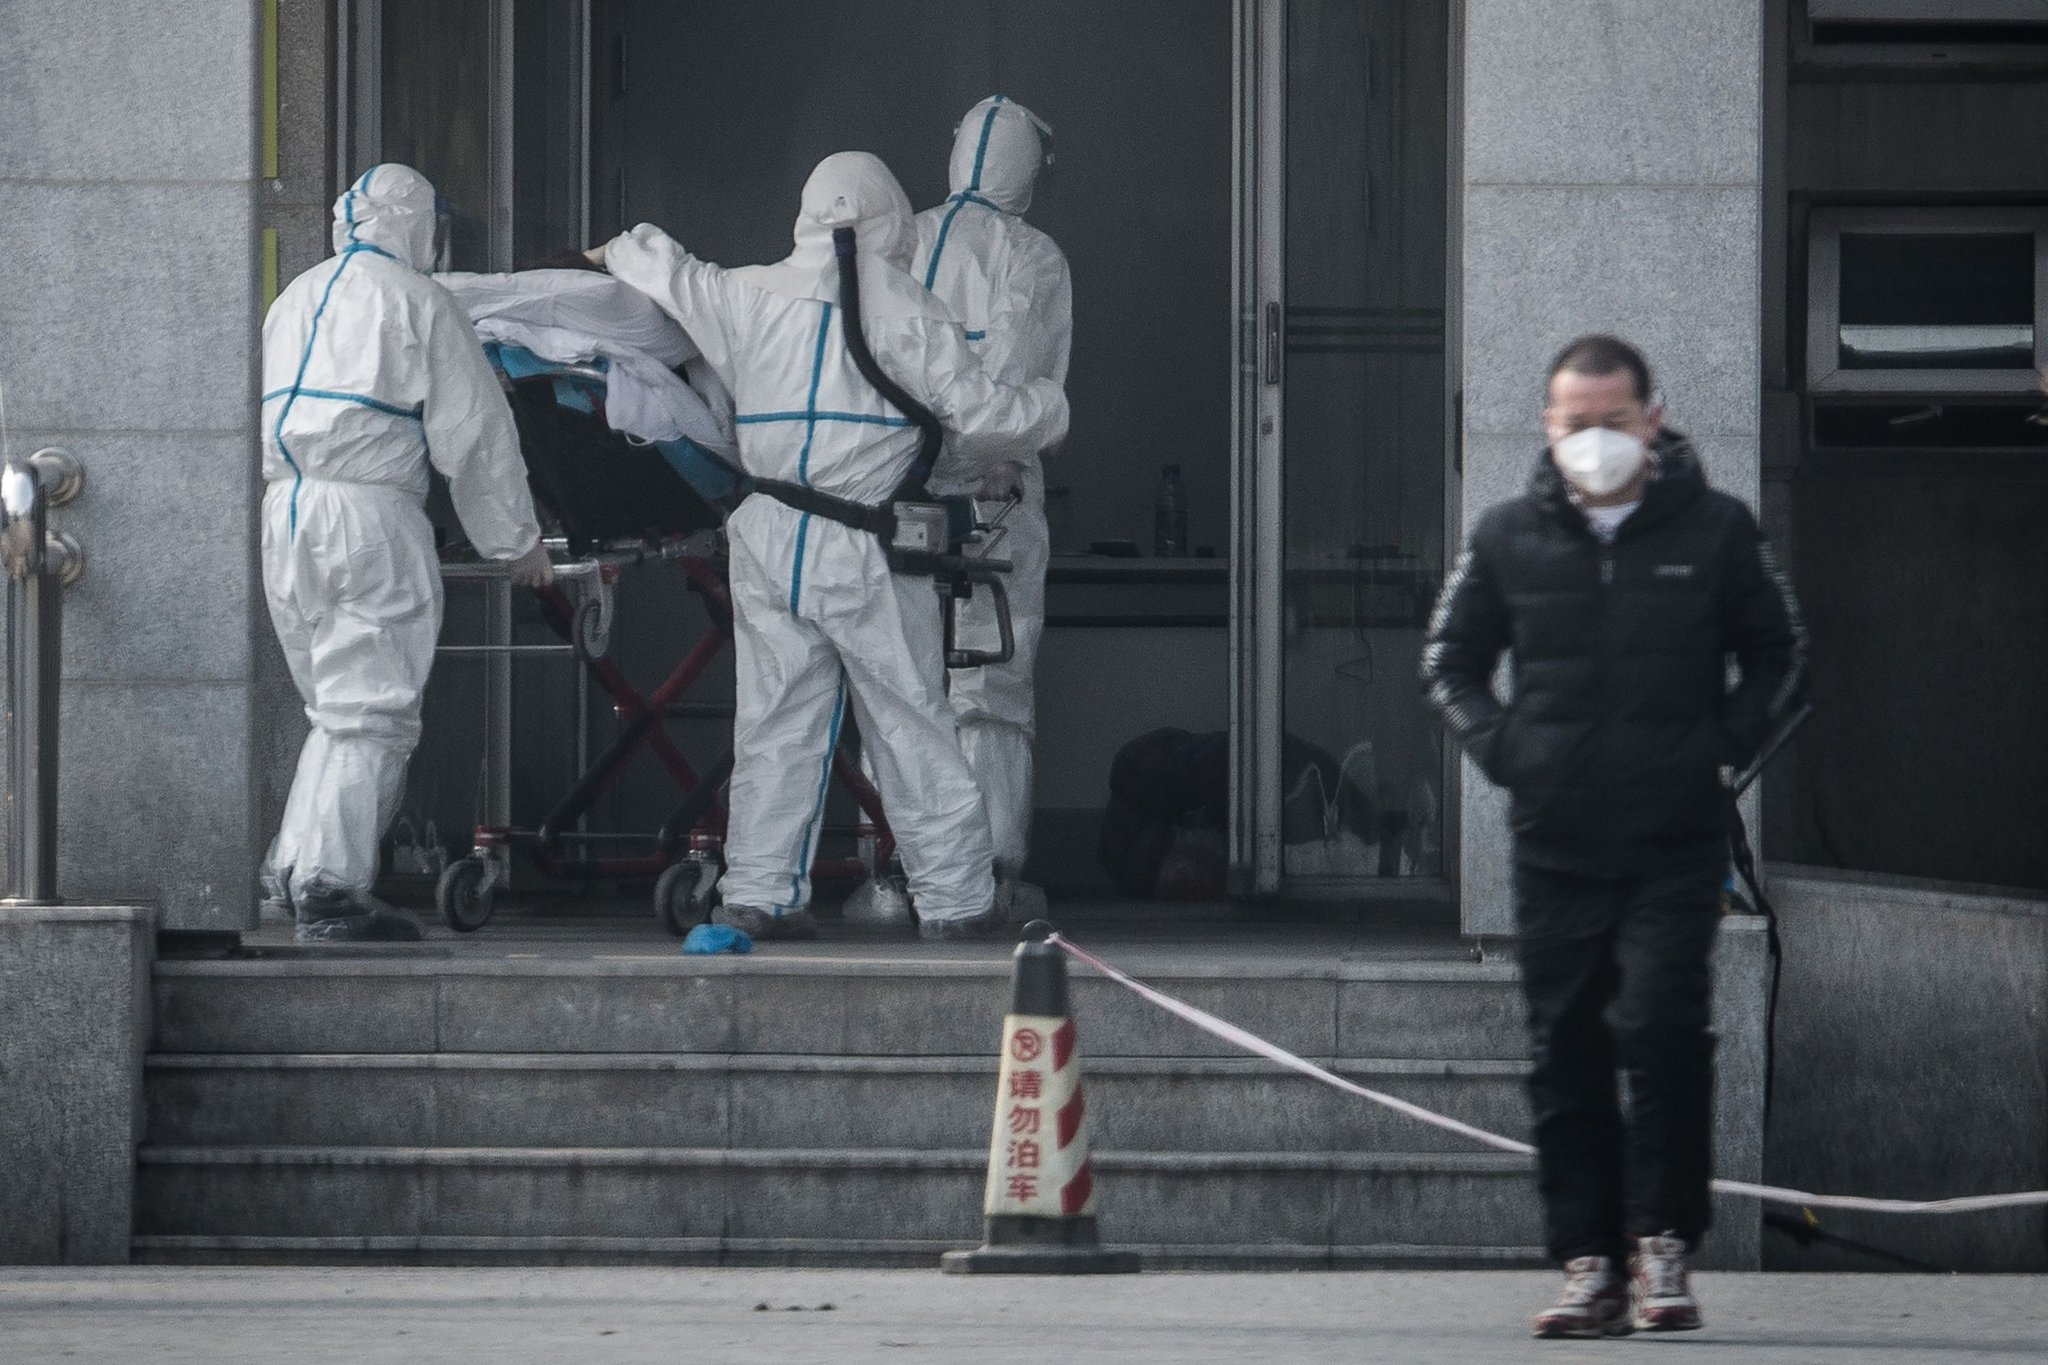 China Coronavirus Is Declared as an International Emergency